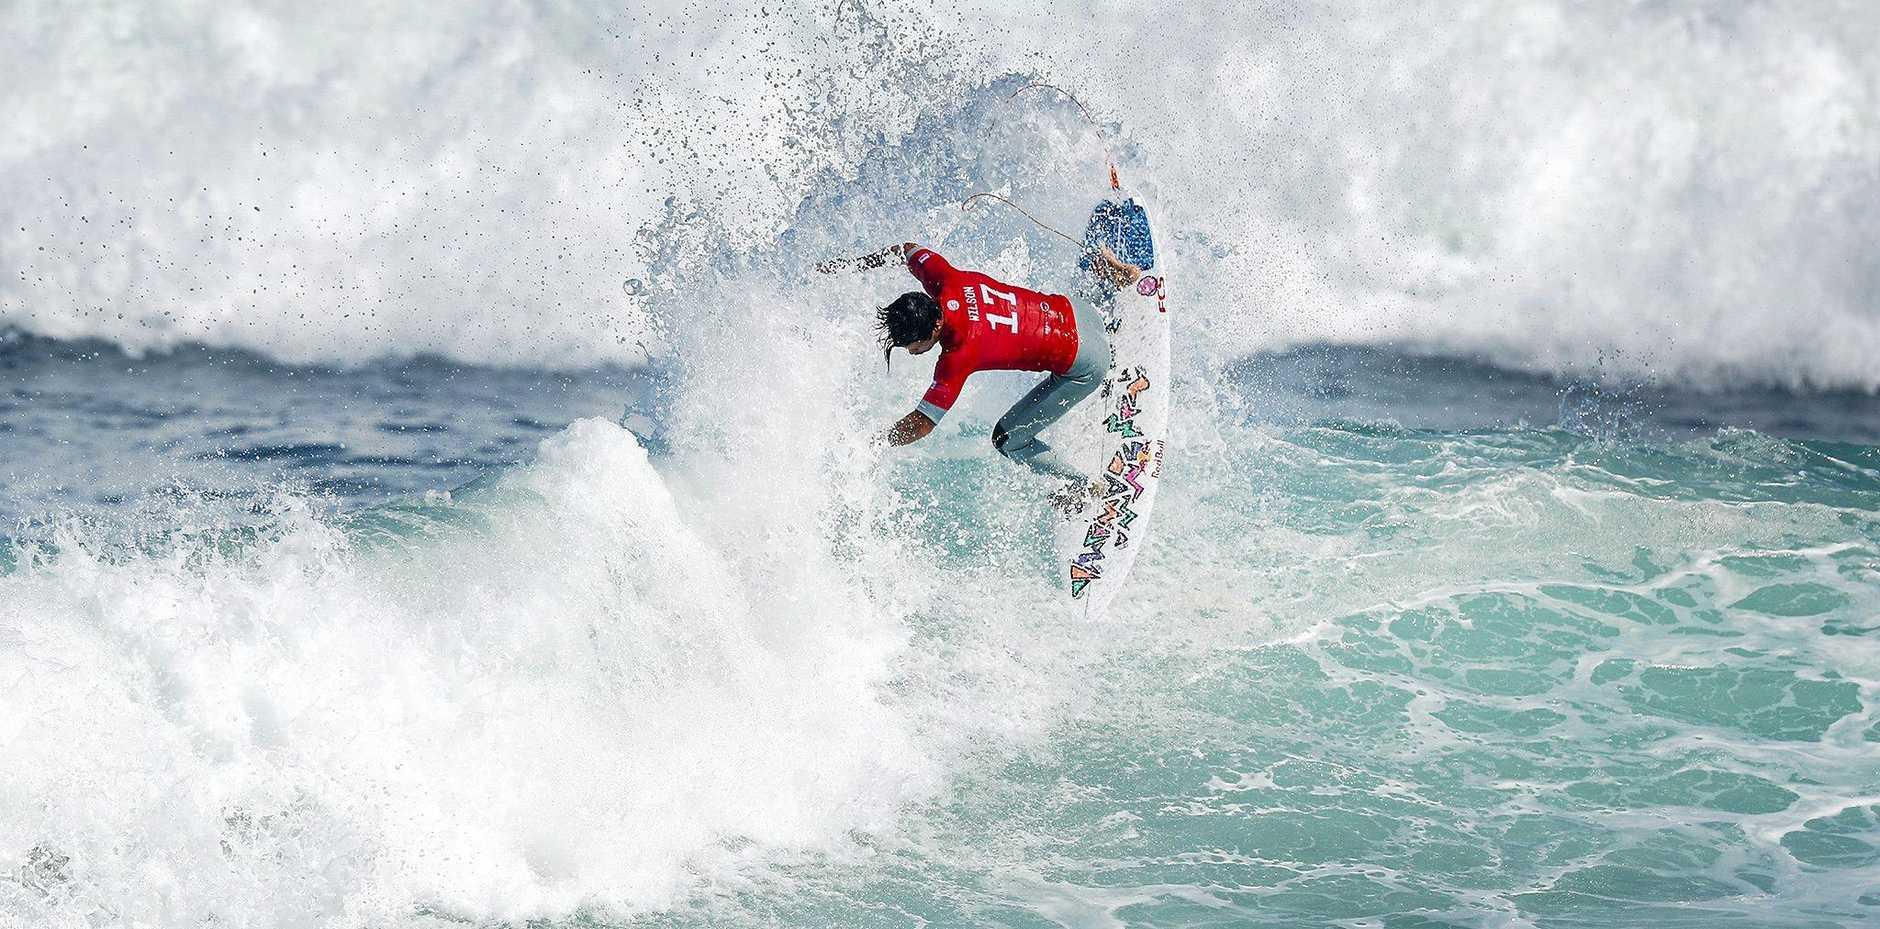 HEAT WINNER: Julian Wilson in round one of the Oi Rio Pro at Saquarema at Rio de Janeiro, Brazil.